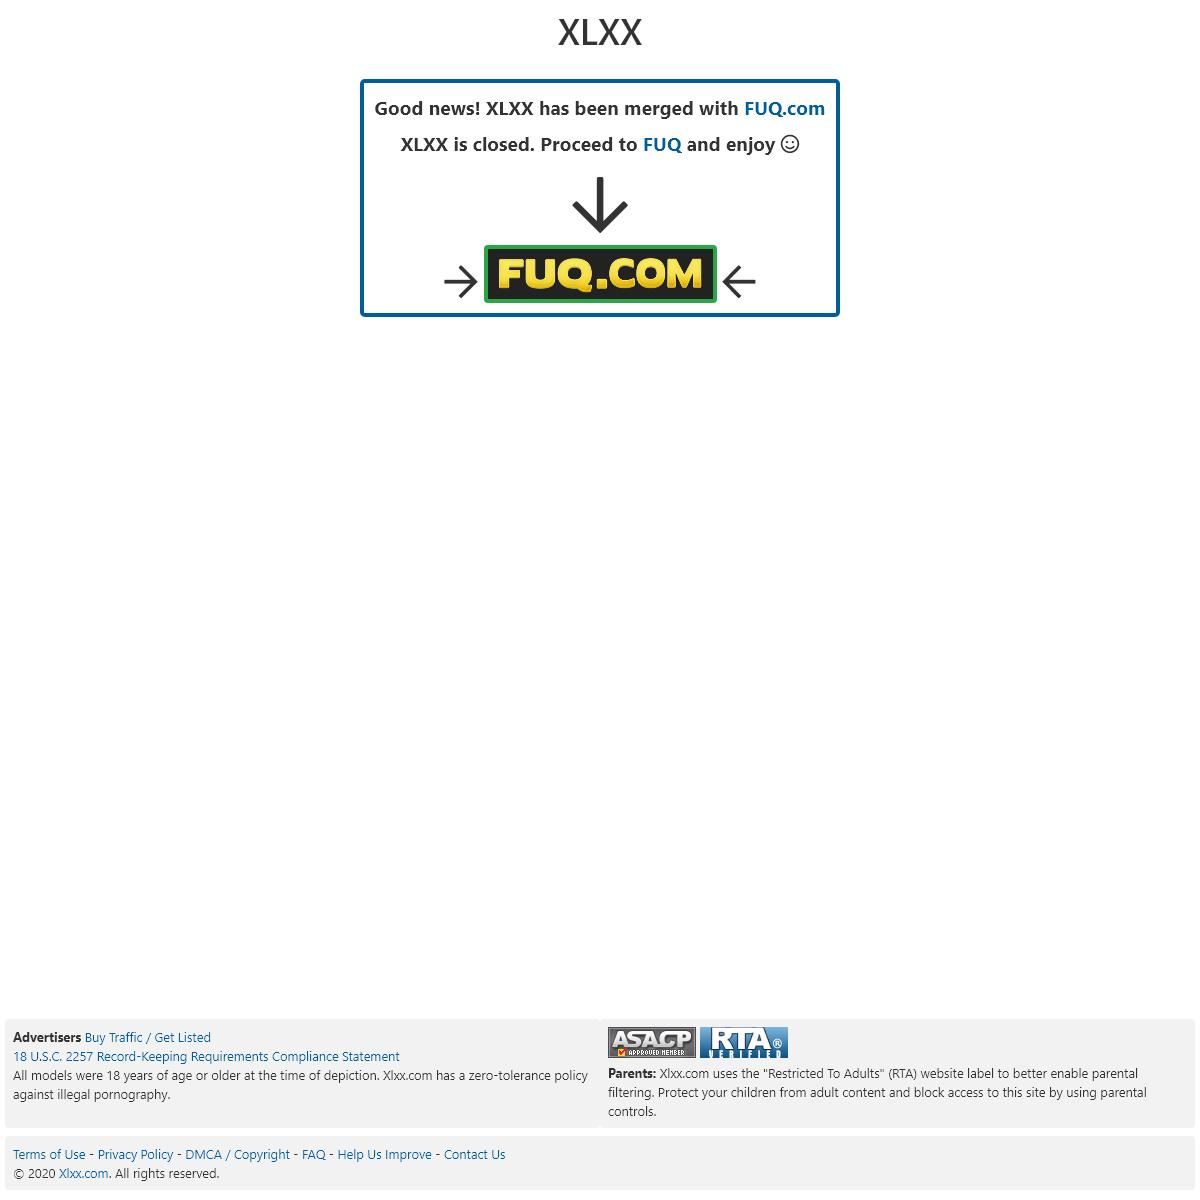 A complete backup of www.www.xlxx.com